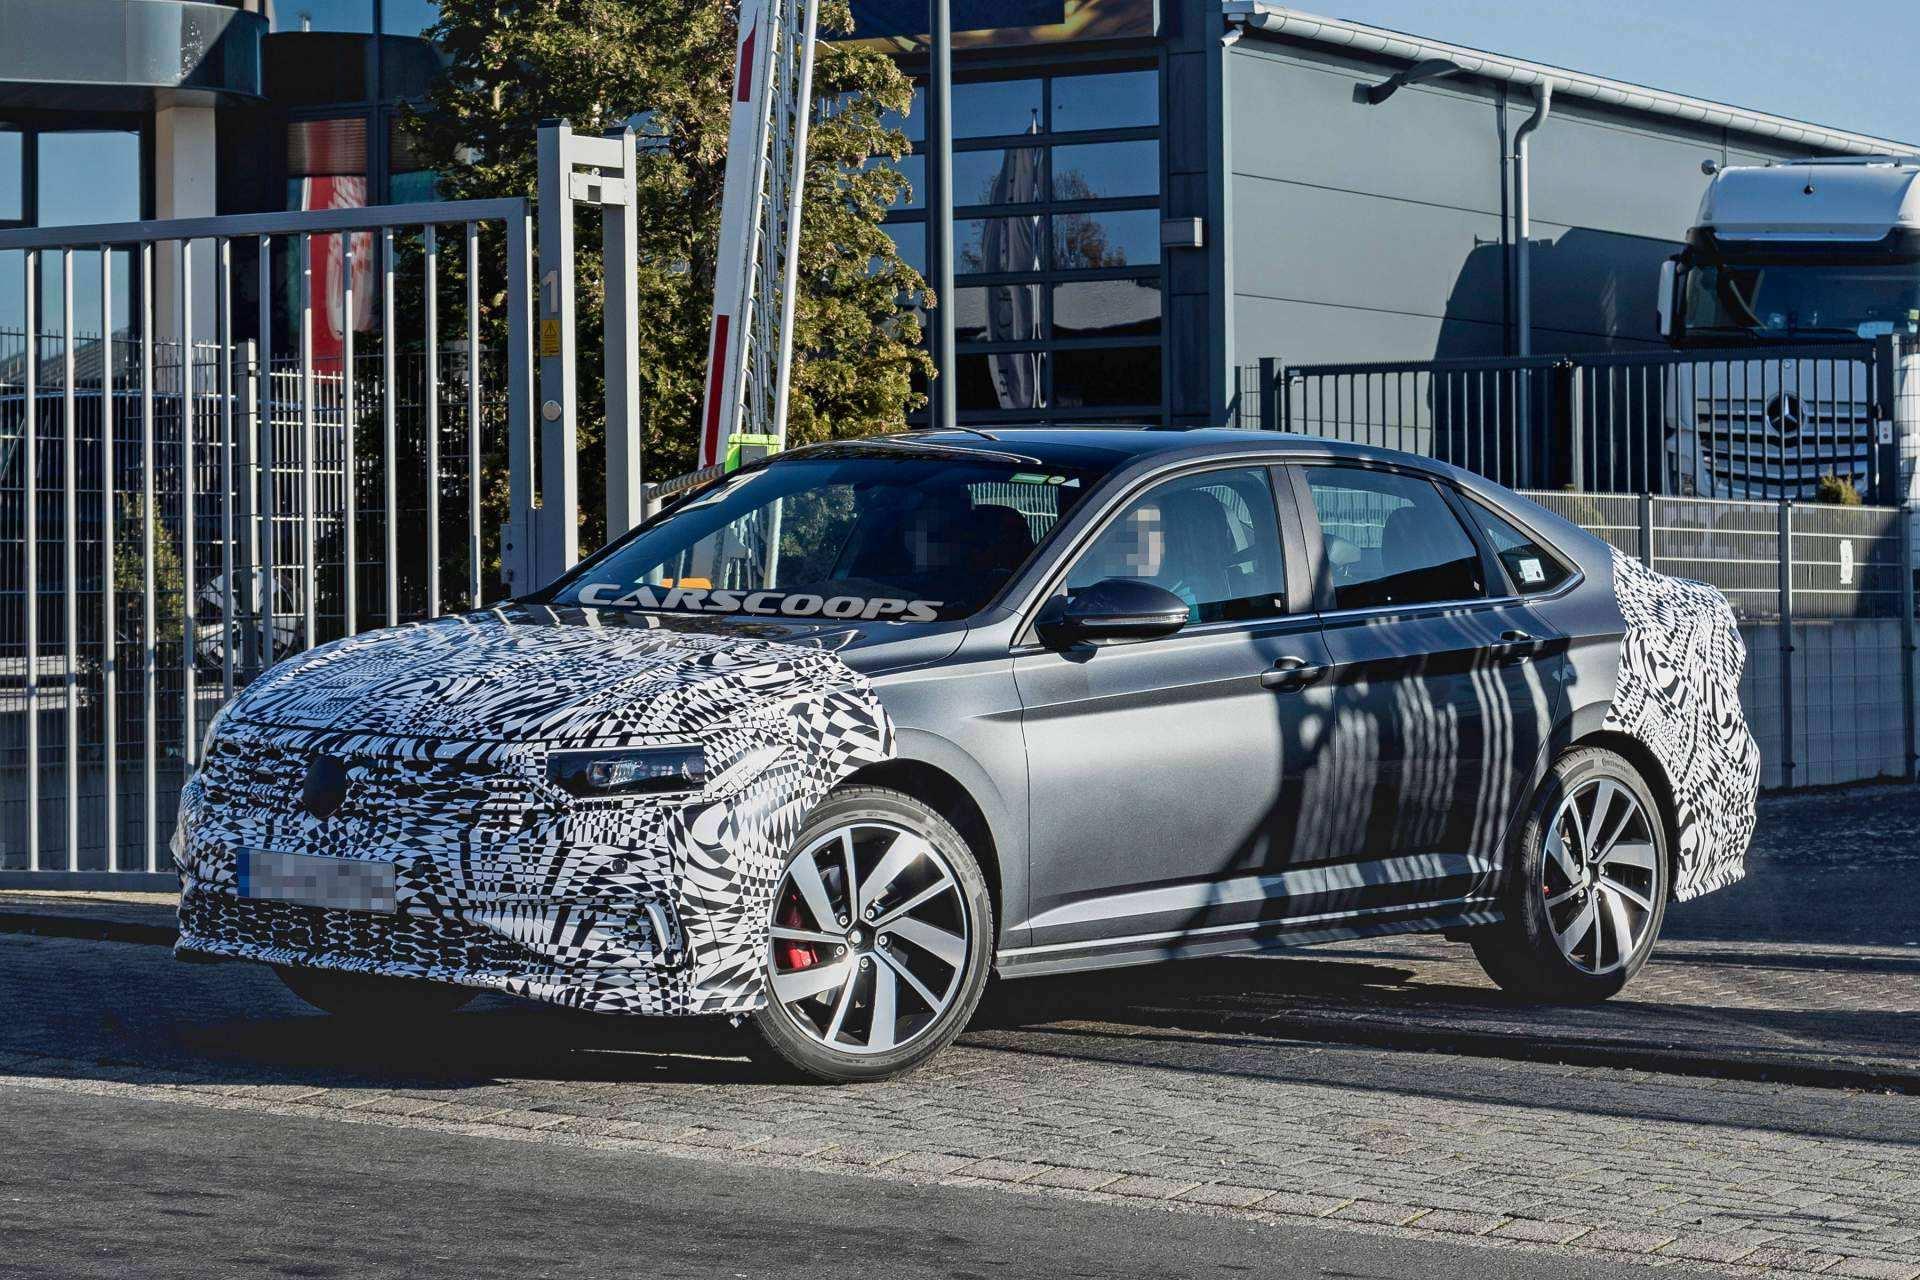 34 Gallery of 2020 Volkswagen Gli Overview with 2020 Volkswagen Gli